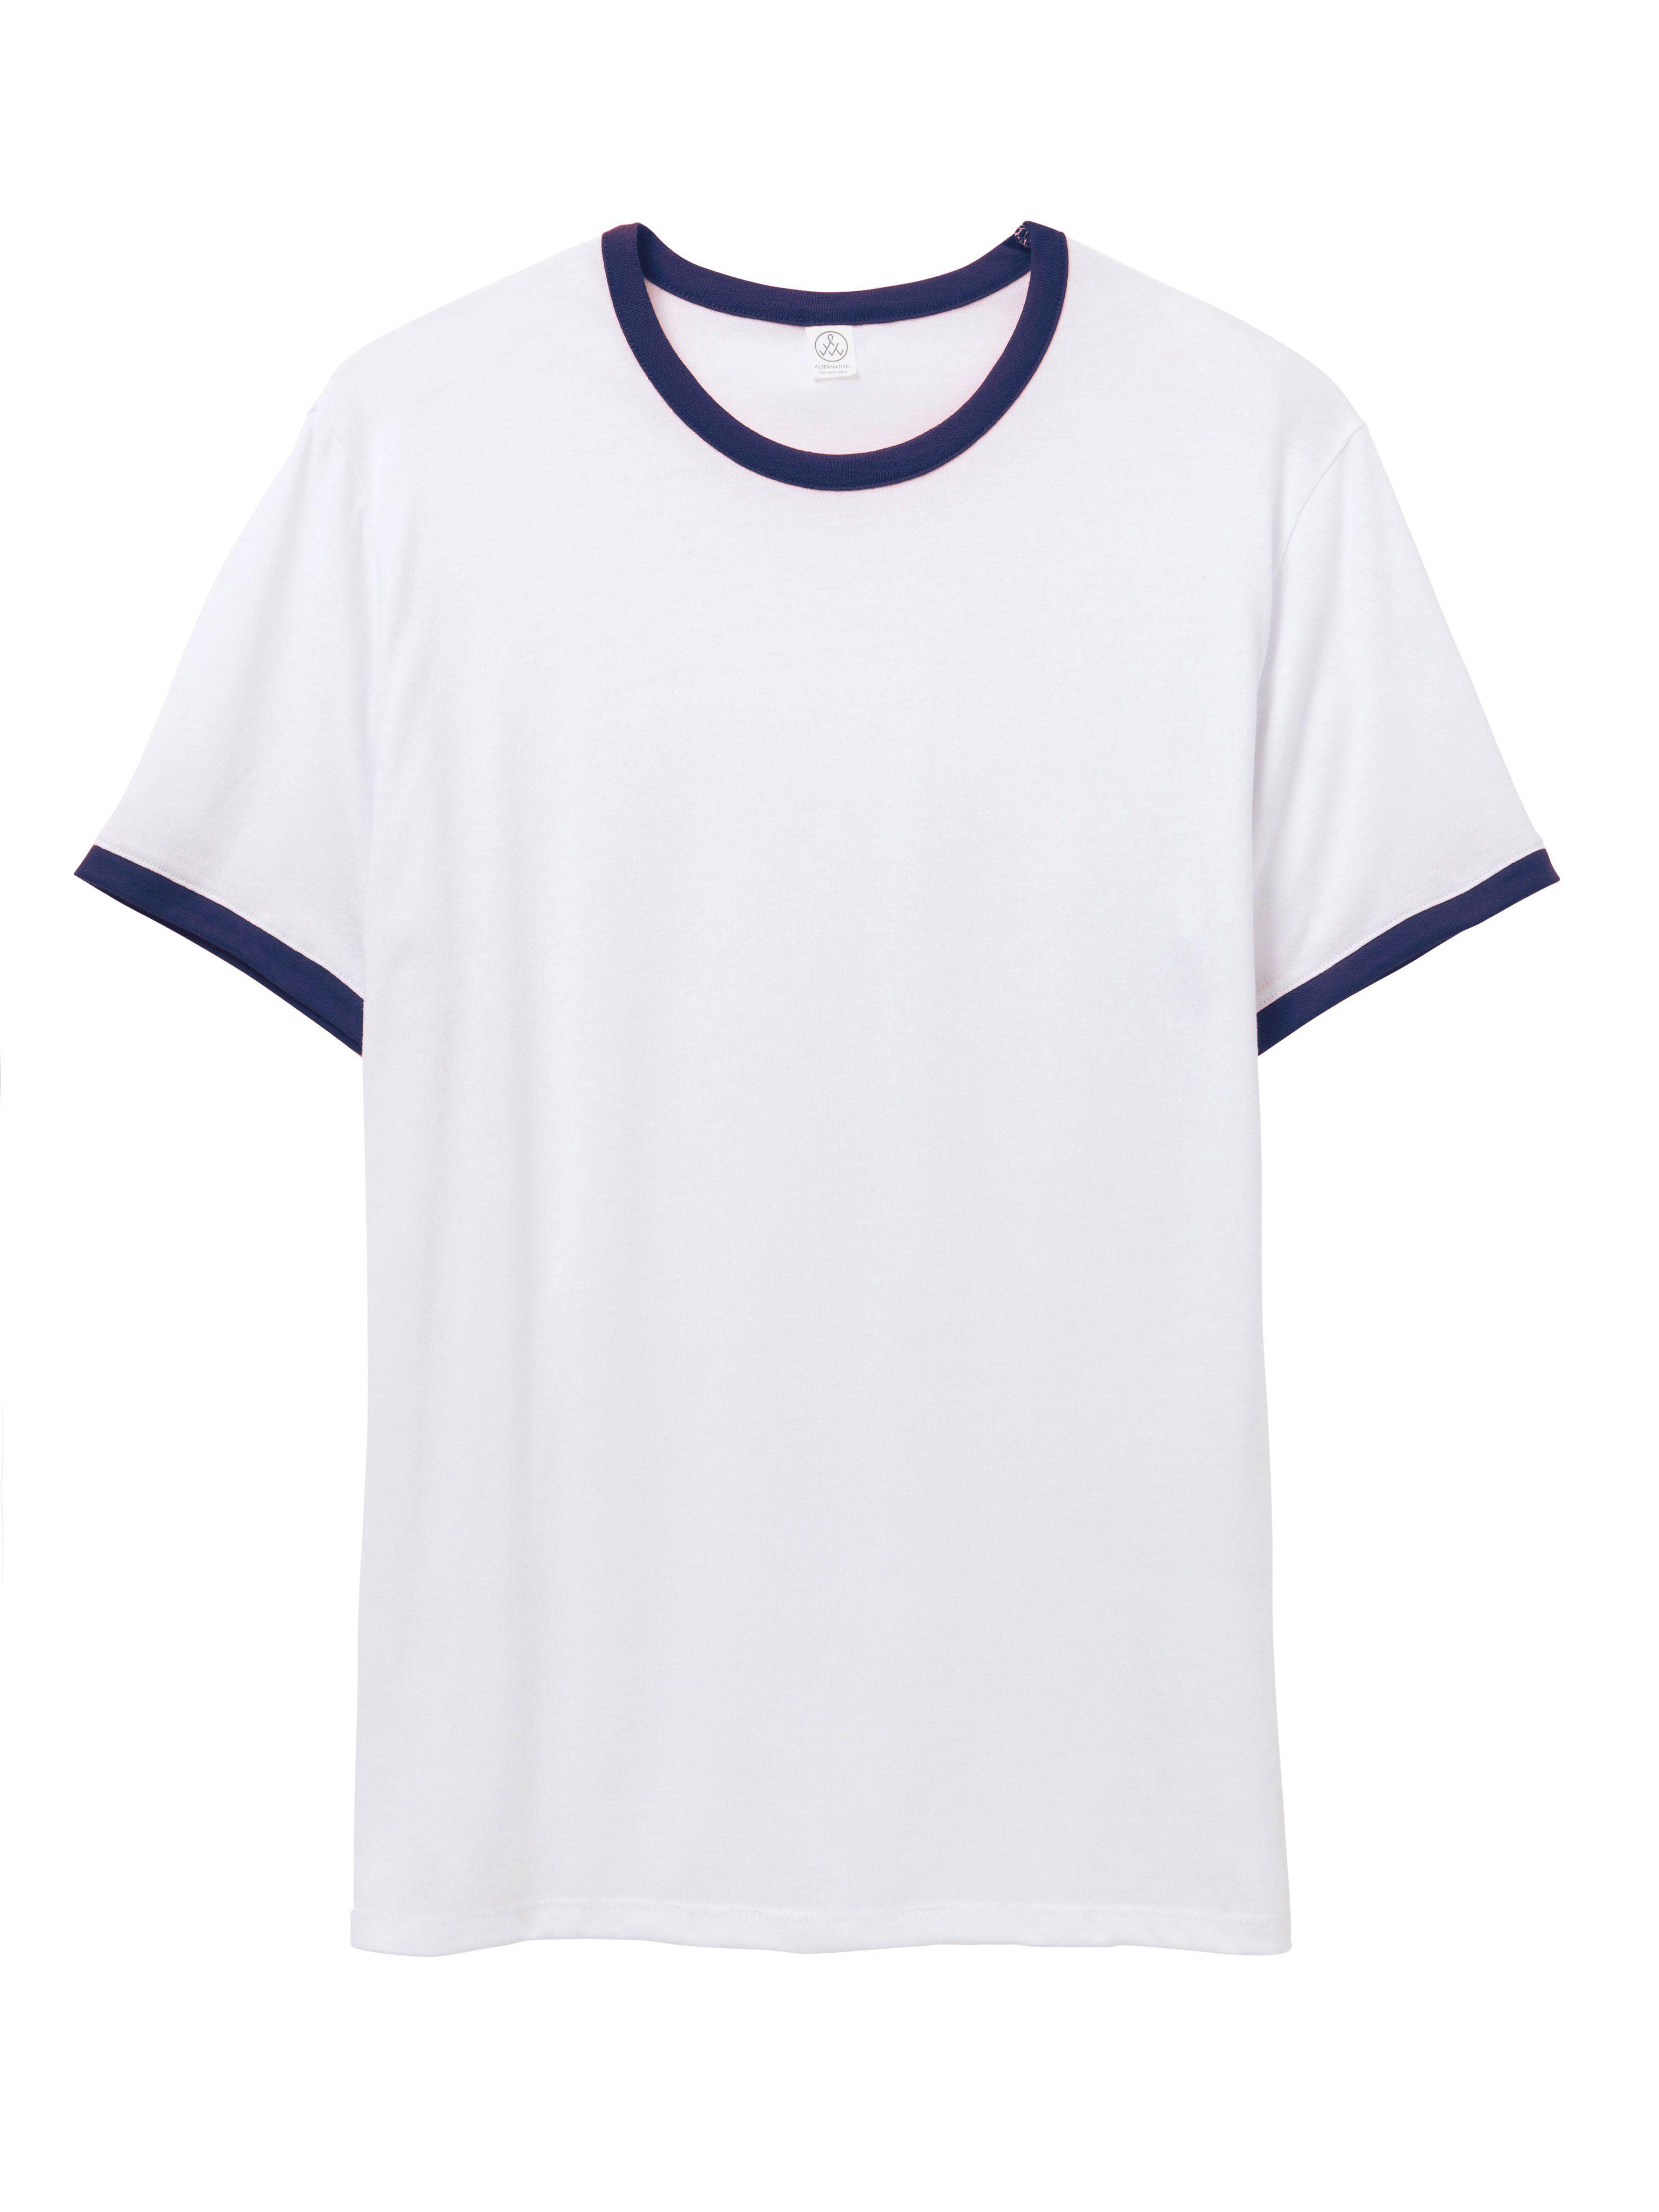 Keeper Vintage Jersey Ringer T Shirt 10 Vintage Jerseys Alternative Outfits Shirts